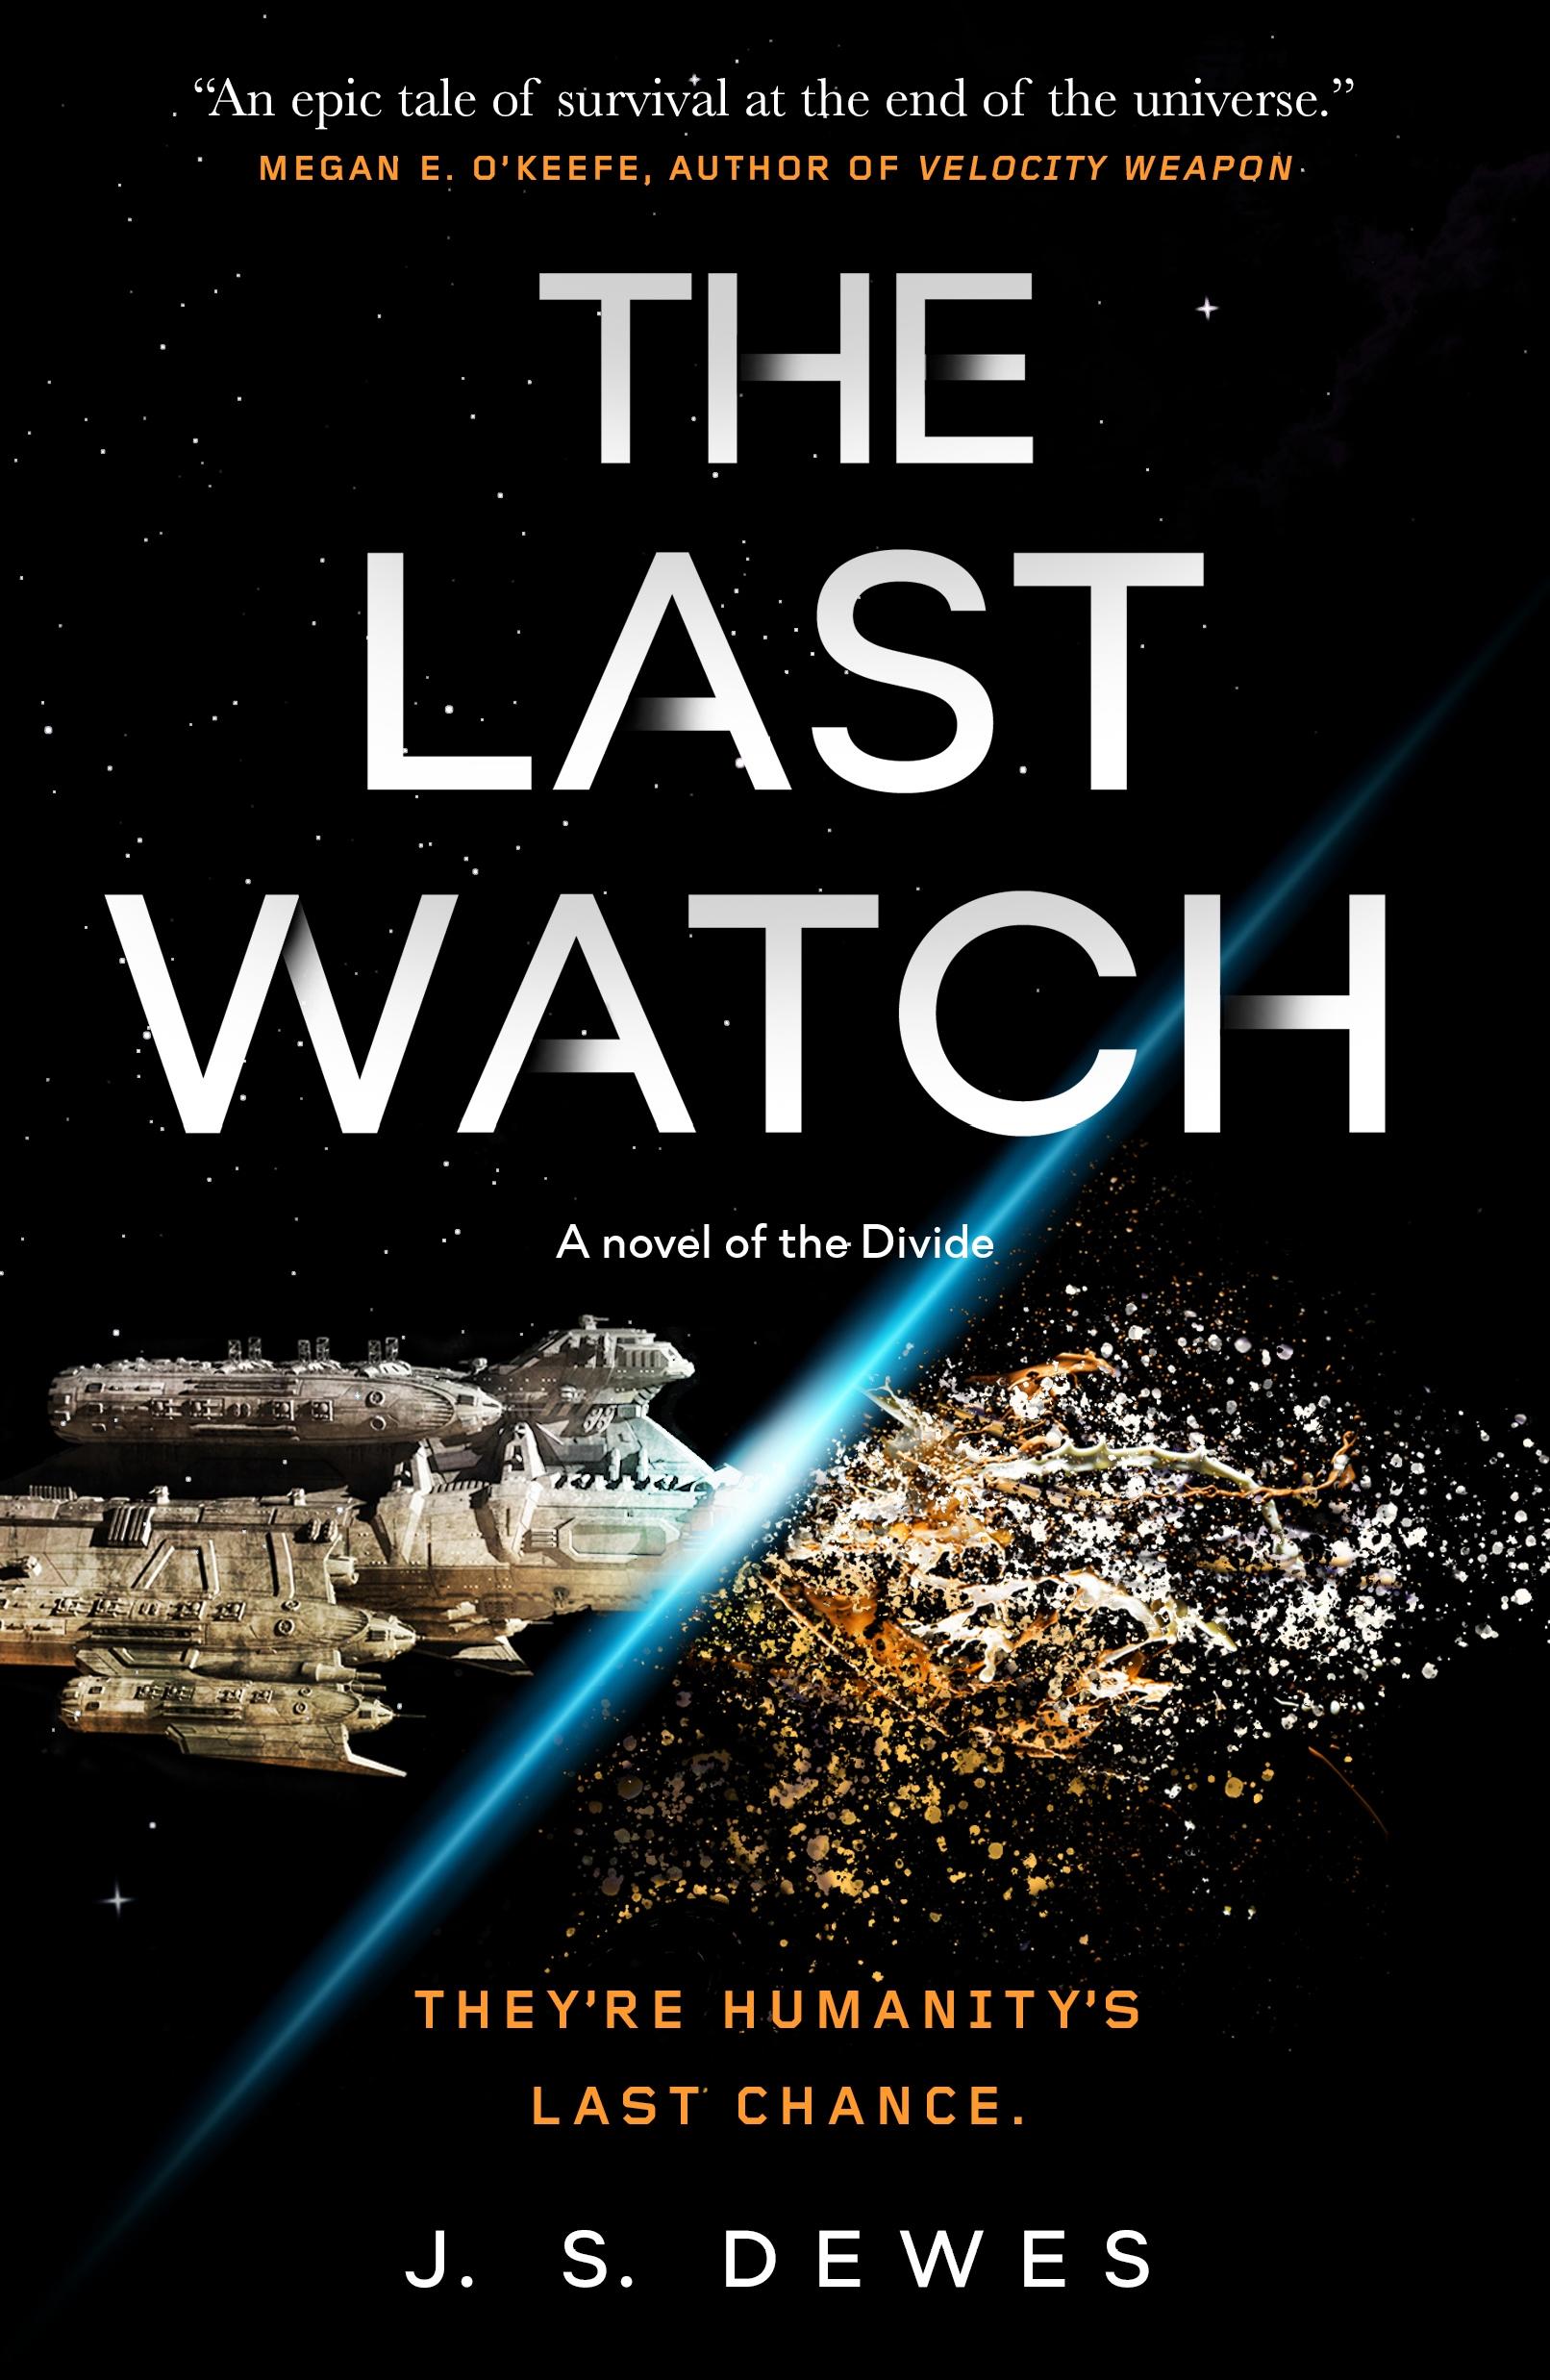 The Last Watch